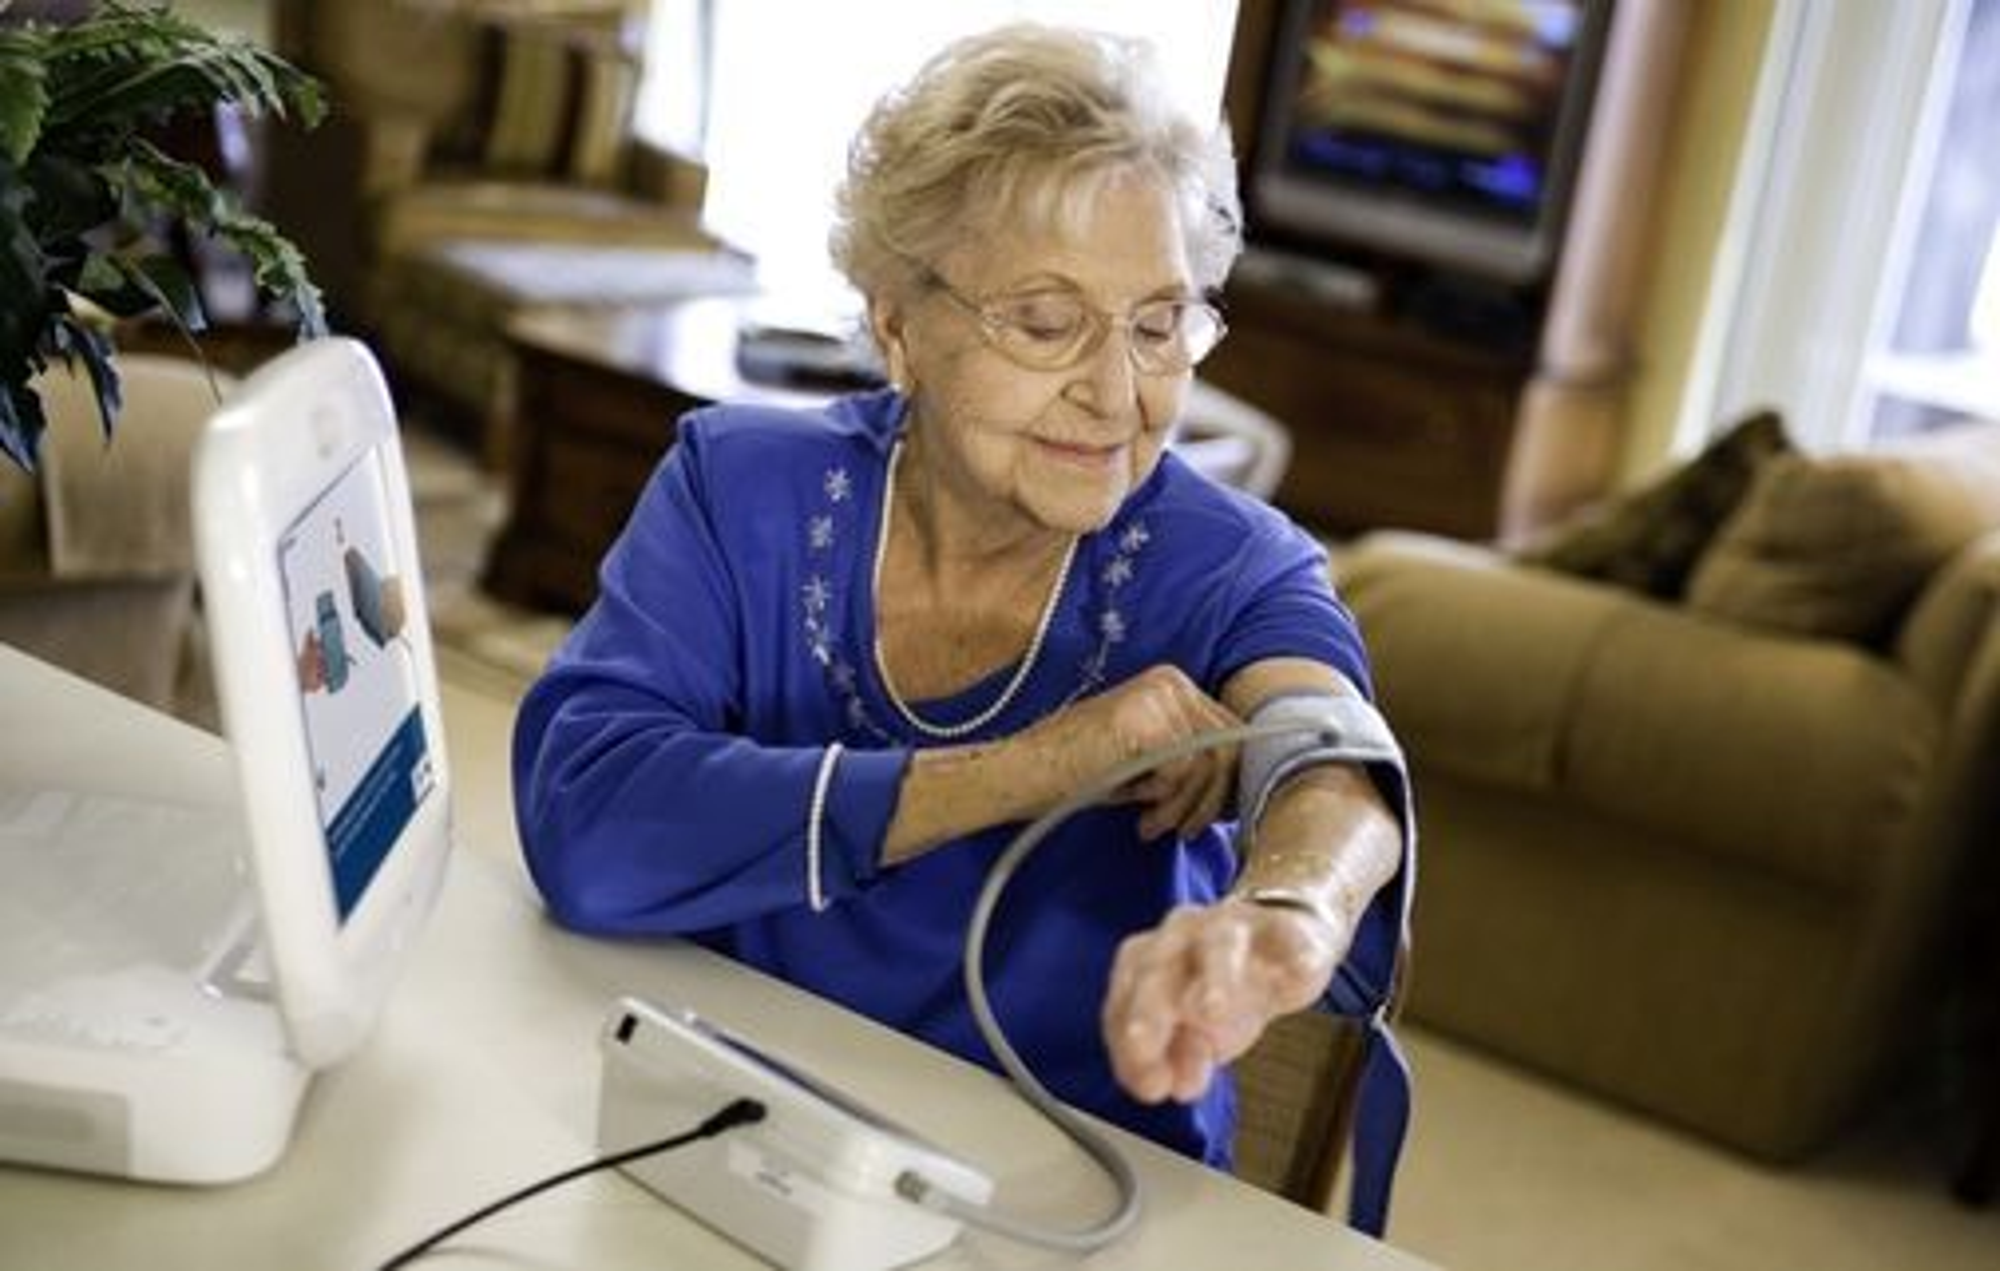 Hensiktsmessig og lettbrukt apparatur med video kan spare mange besøk til legen, tror Intel.